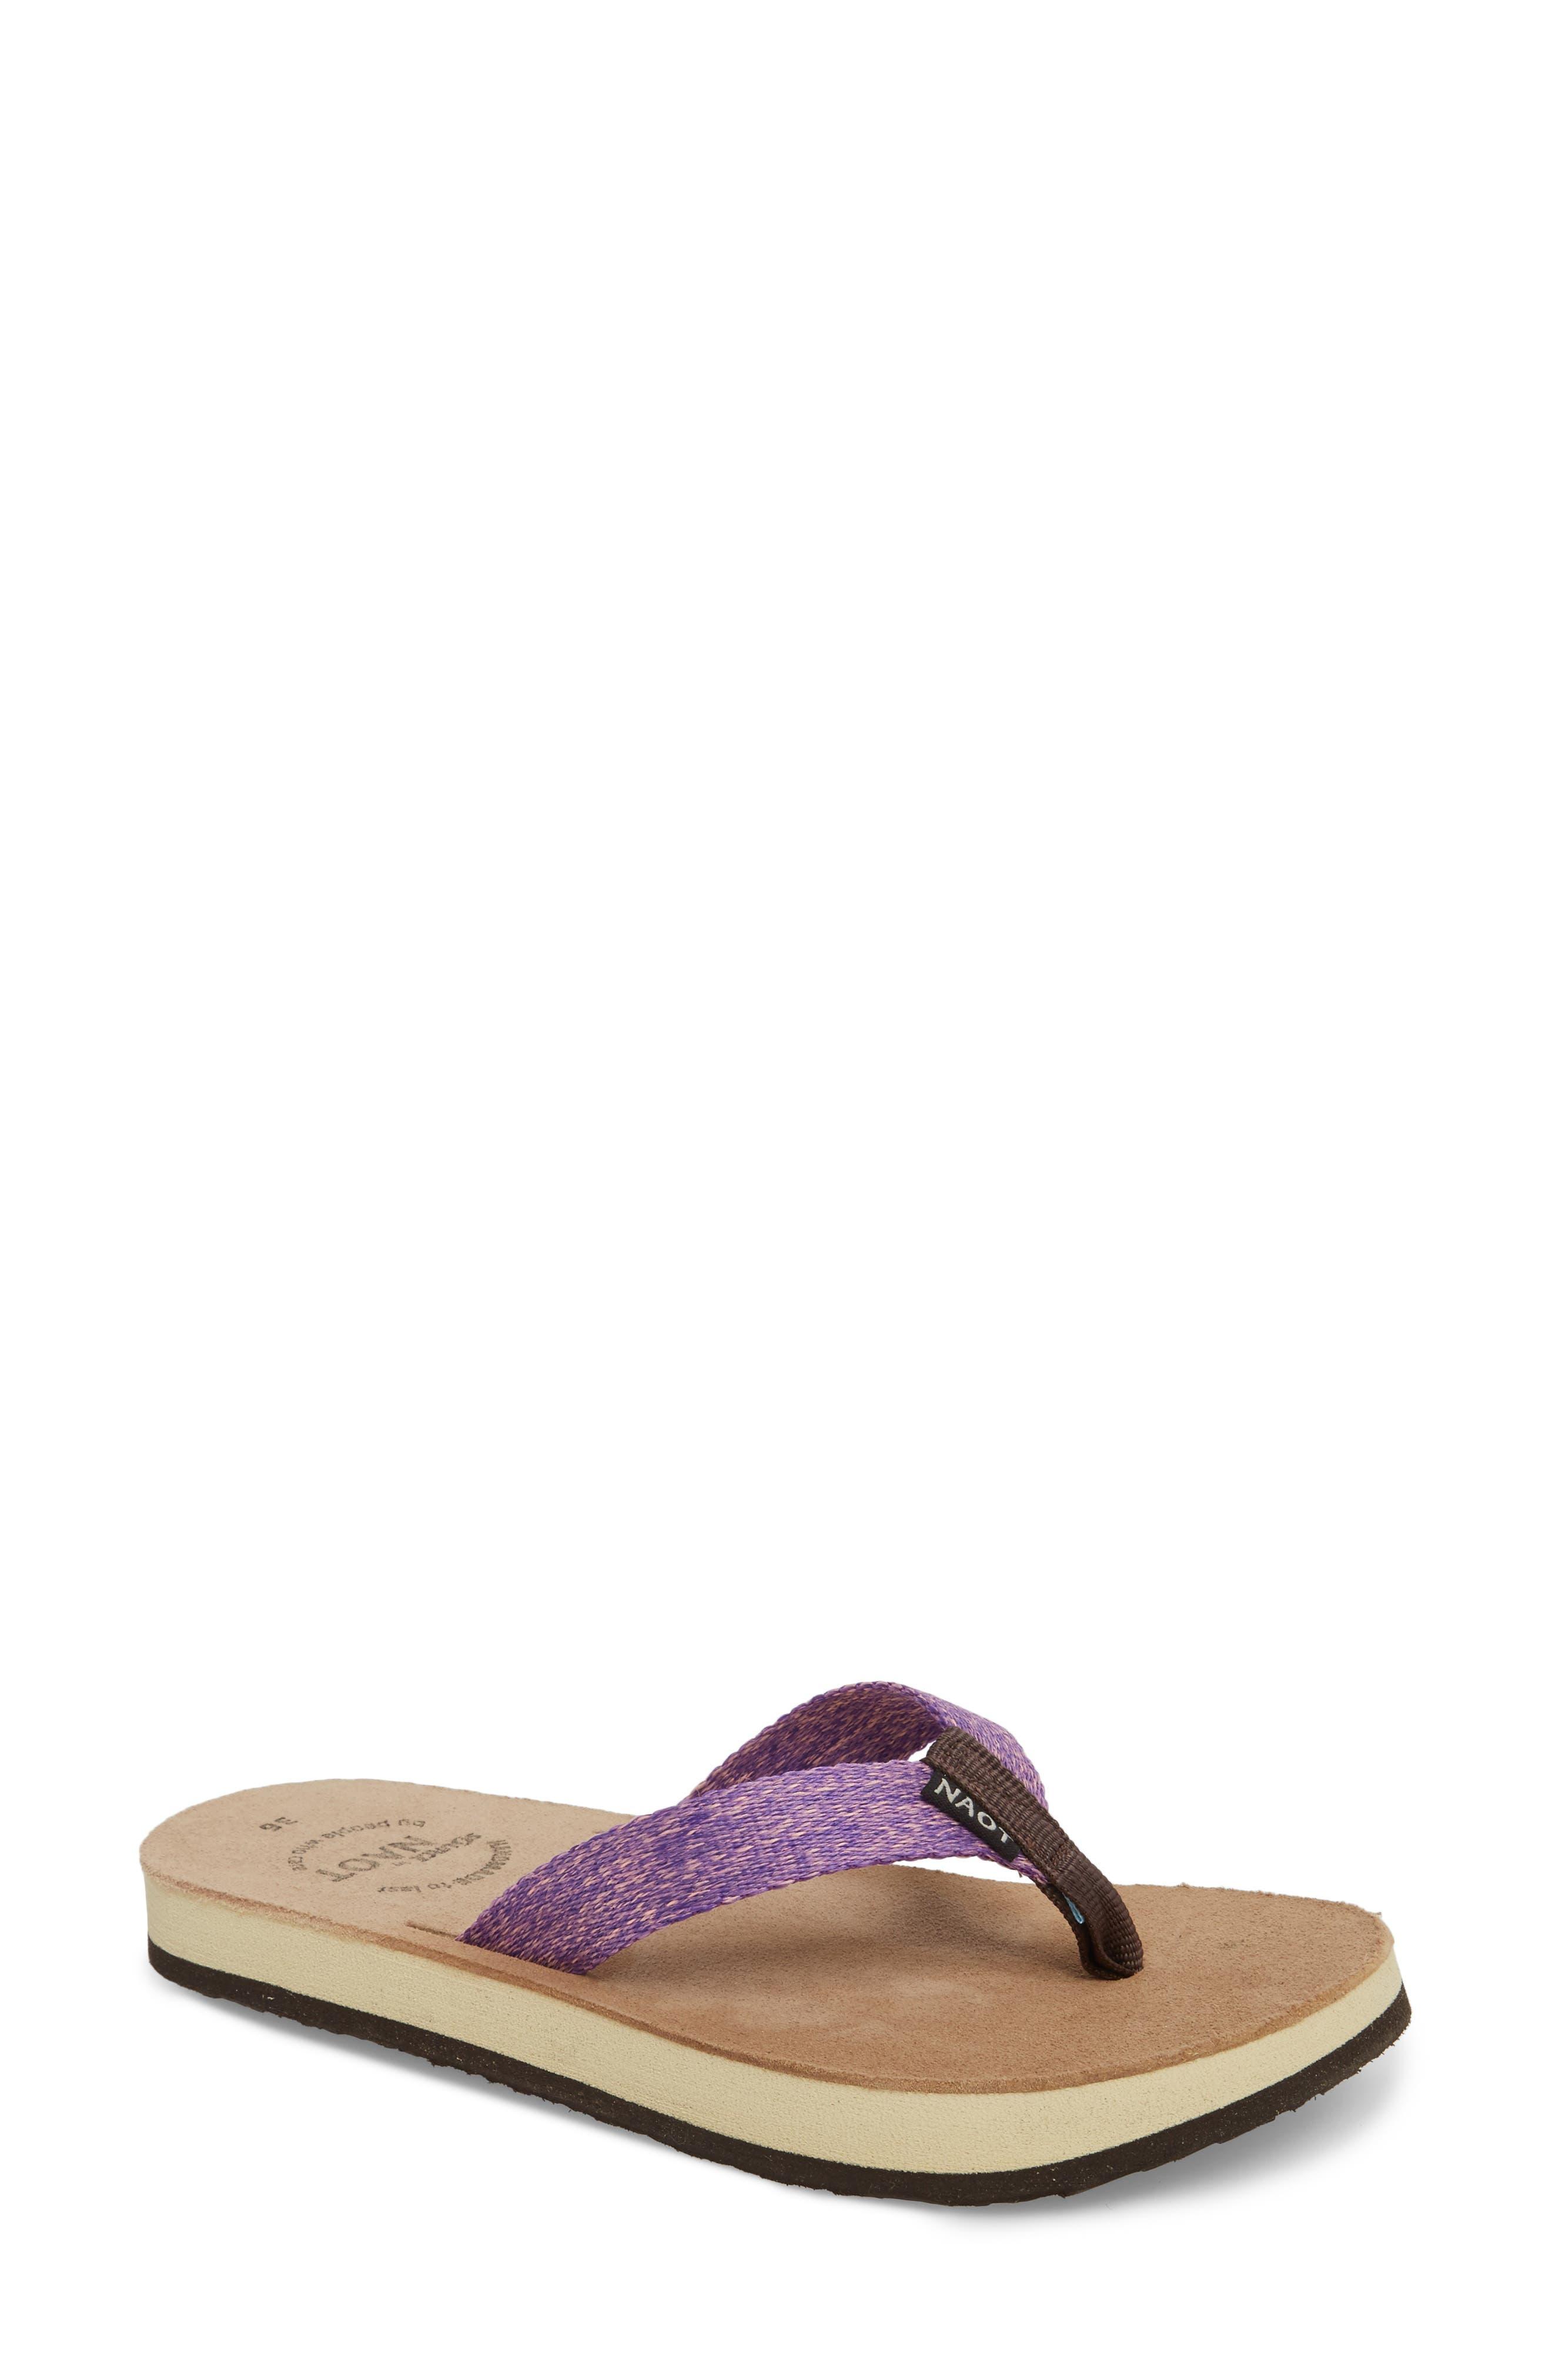 Island Flip Flop,                         Main,                         color, Purple Lilac Fabric